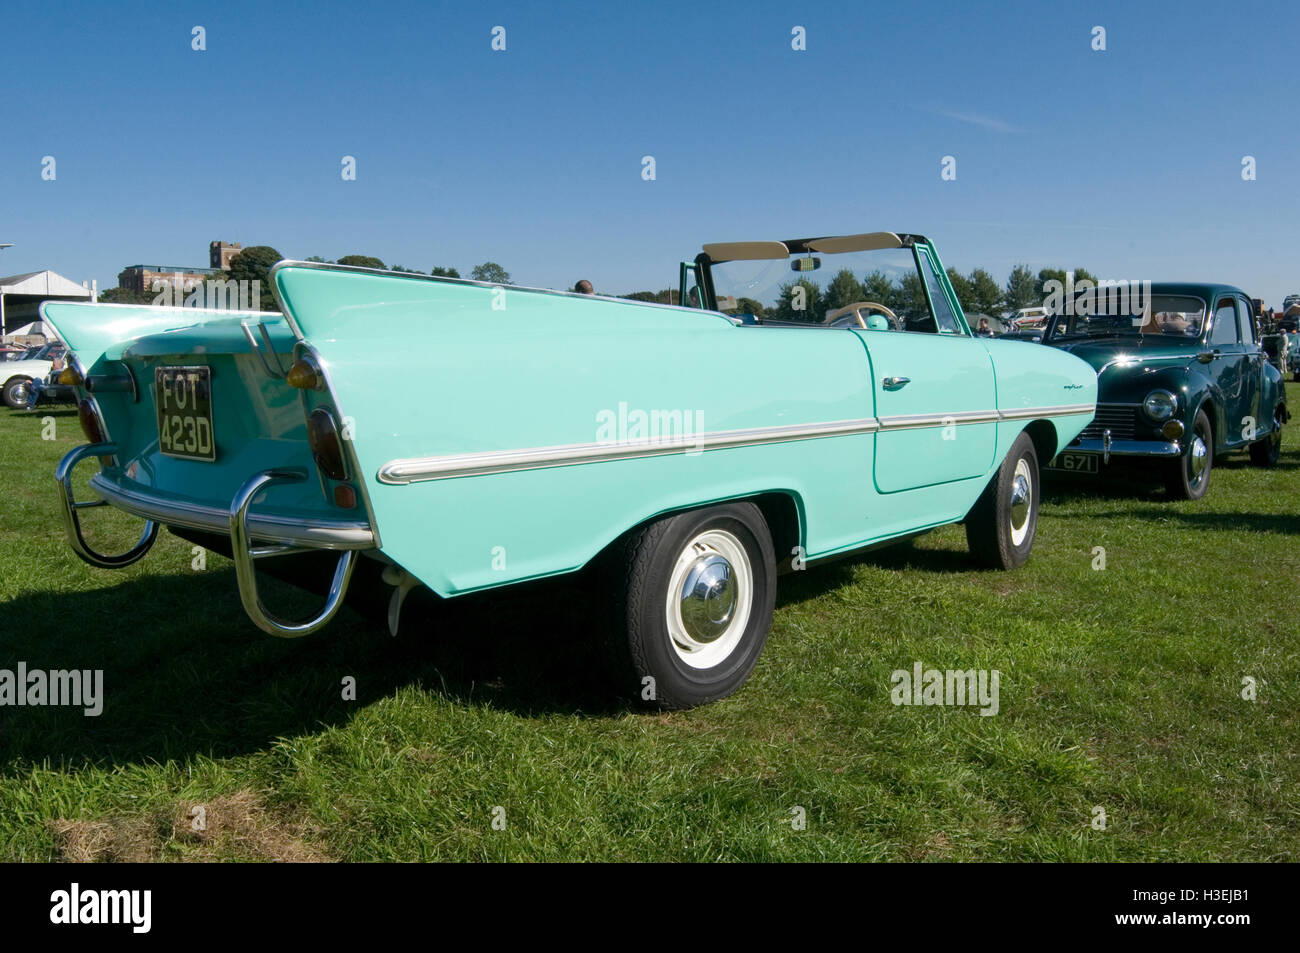 amphicar car boat amphibious vehicle vehicles Stock Photo